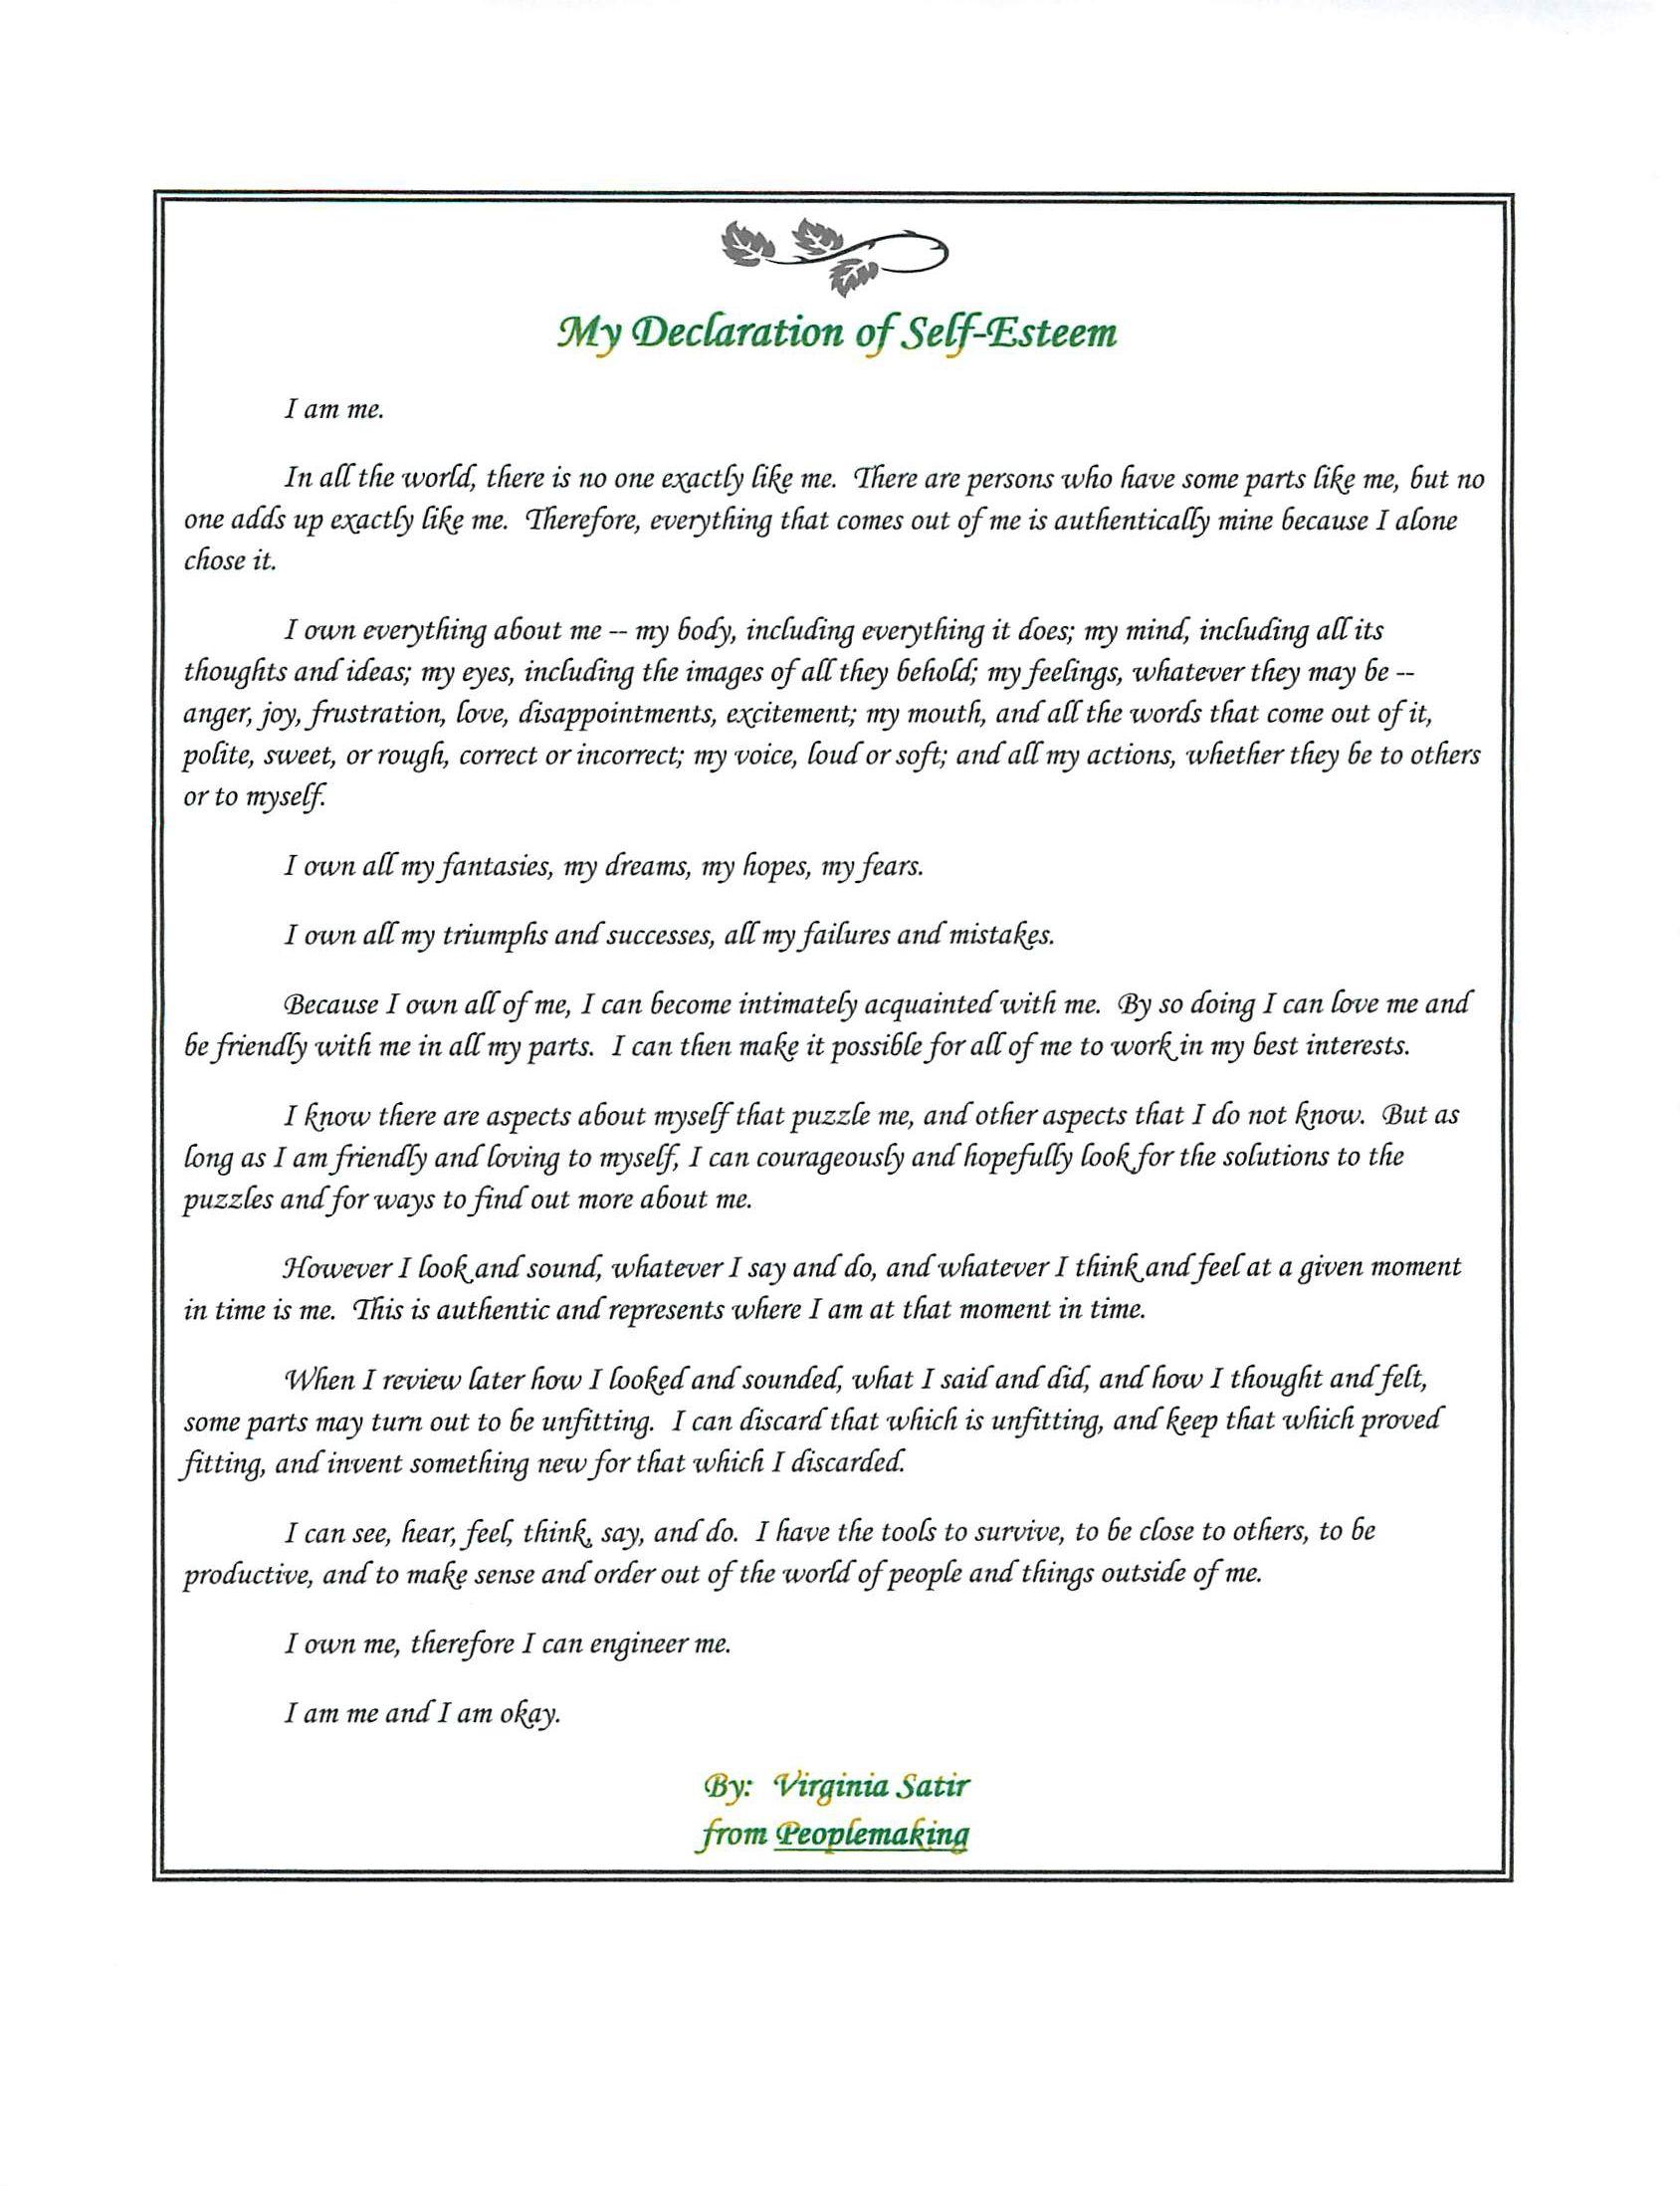 My Declaration Of Self Esteem By Virginia Satir